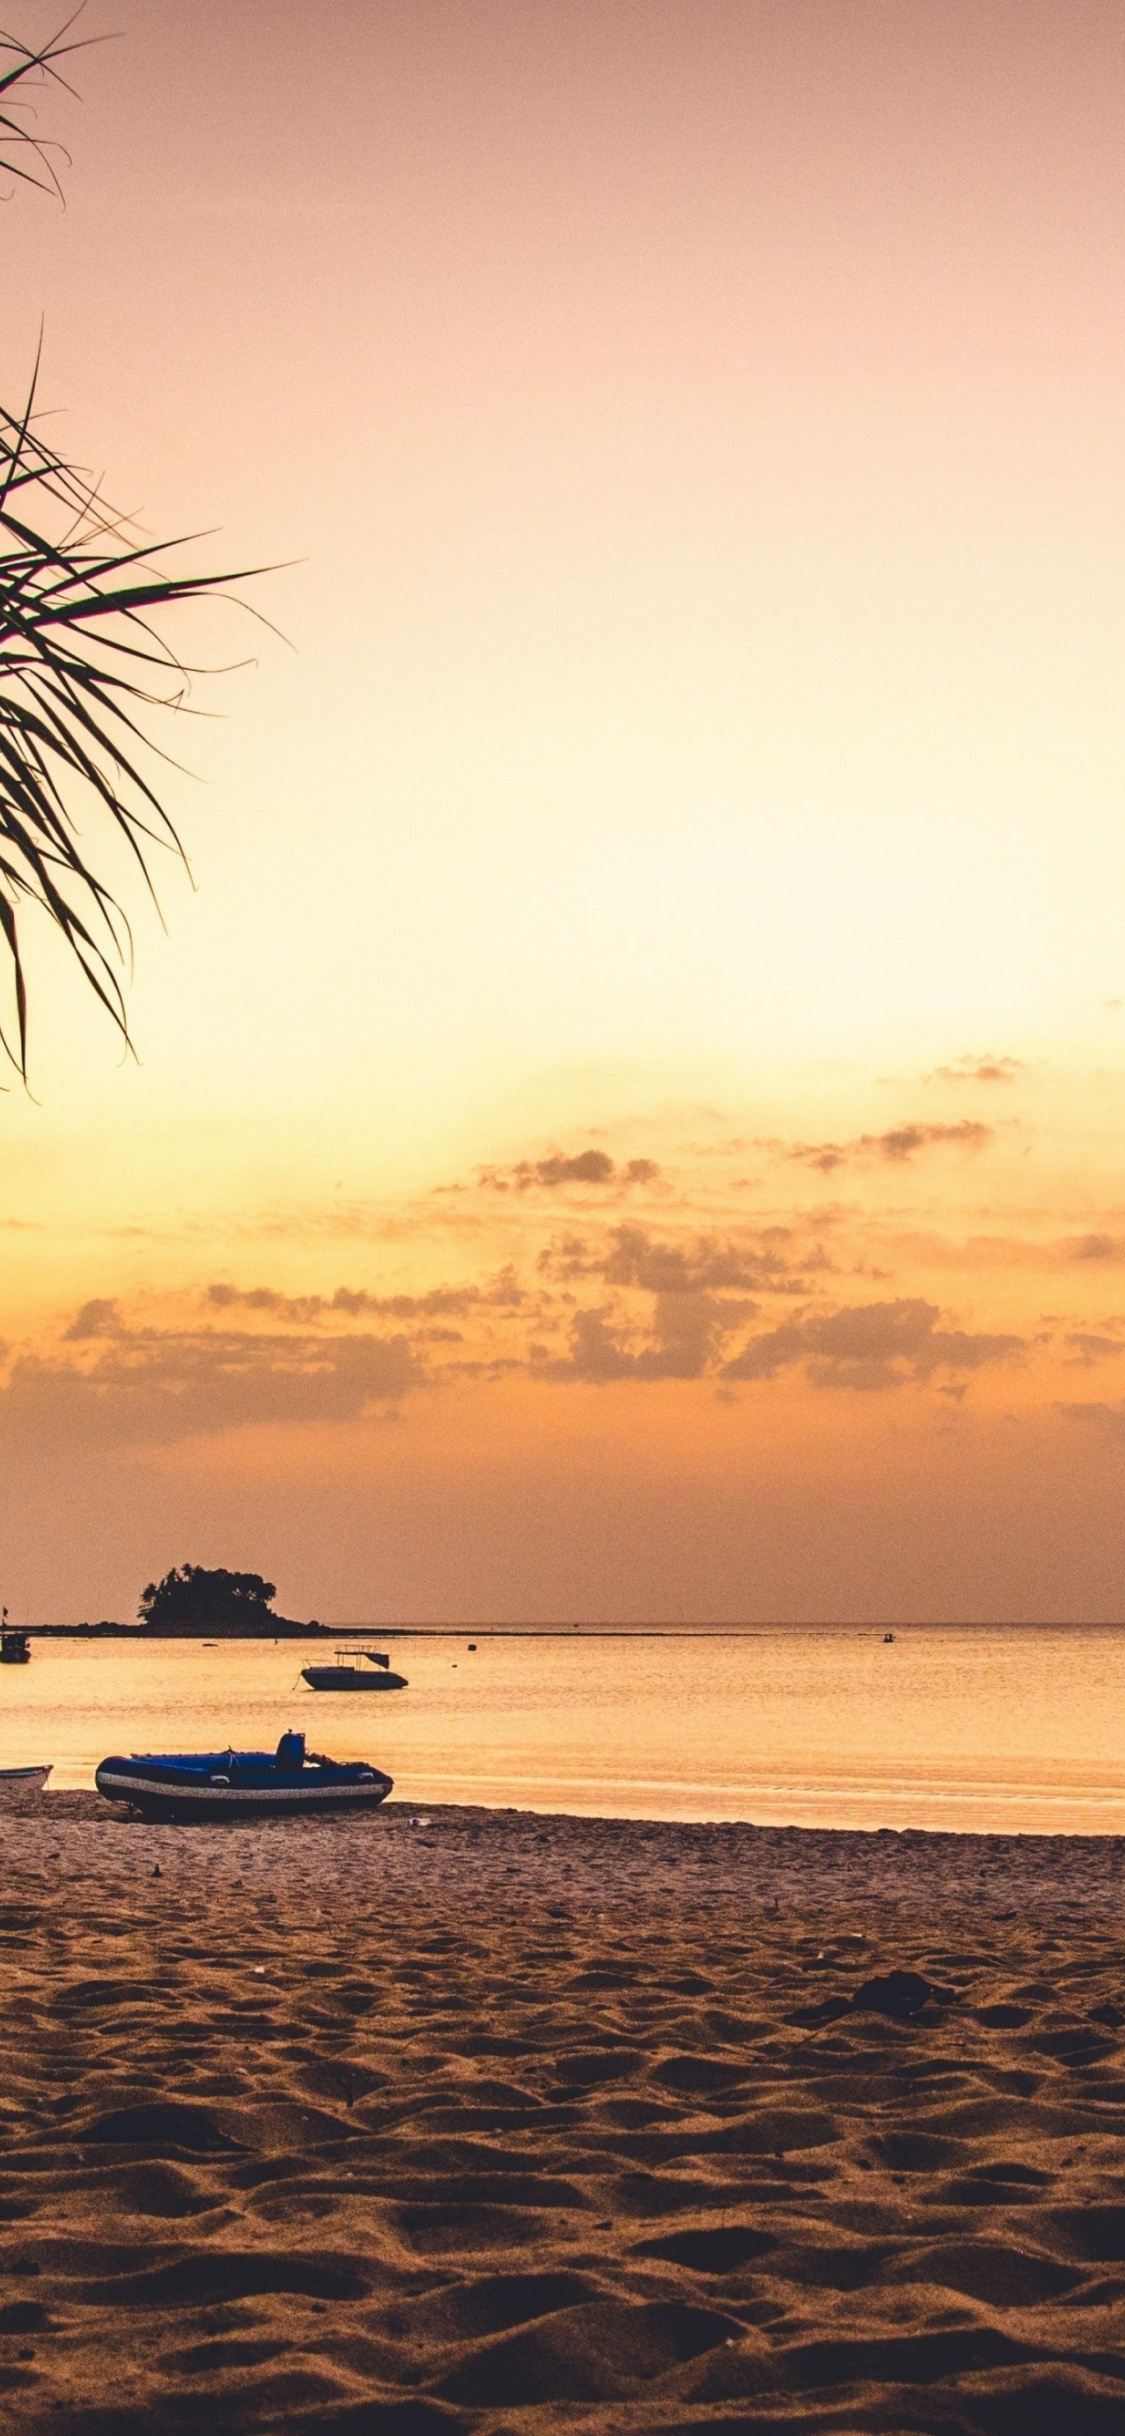 Beach, Sand, Sky, Palm Tree, Sunset, Wallpaper - Phuket Sunset On Beach - HD Wallpaper